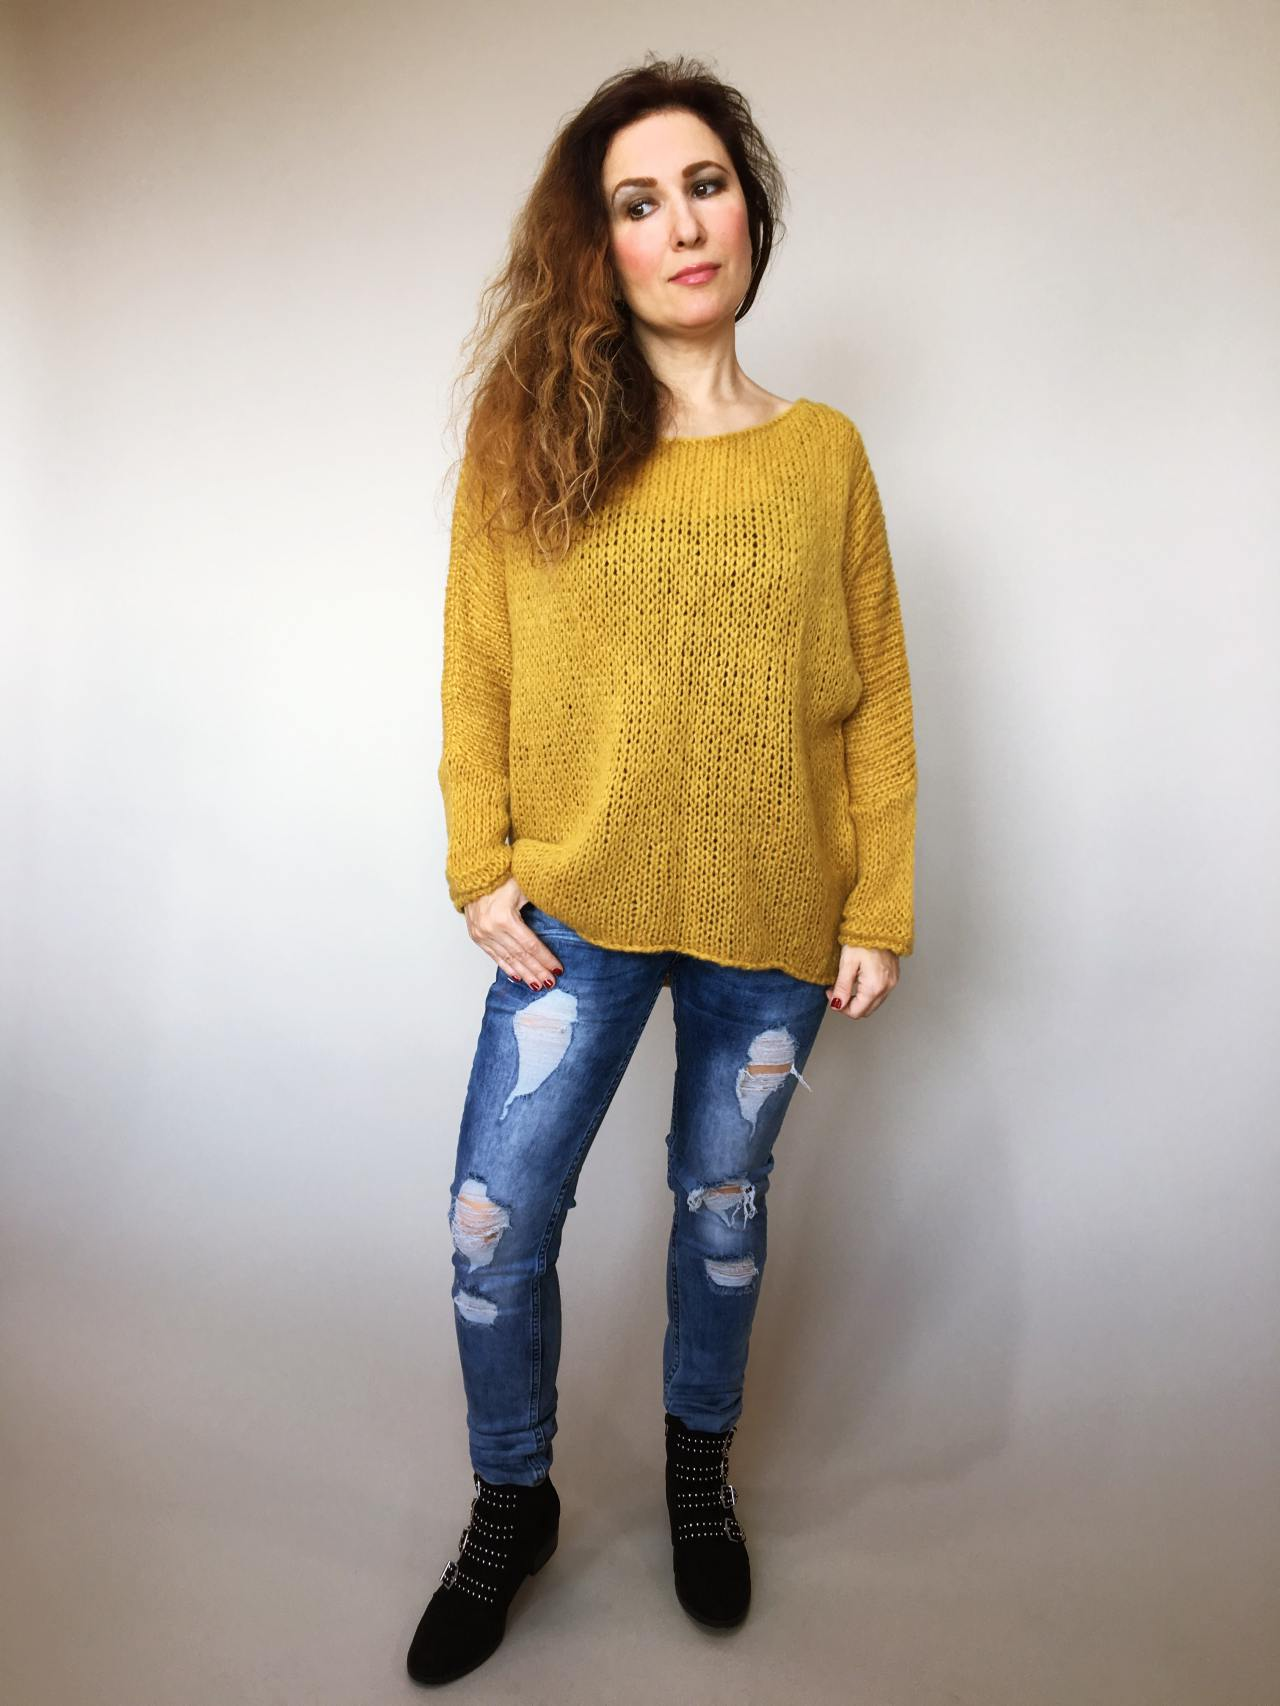 589fe89891d Žlutý svetr Merlin – Simm-Fashion.cz